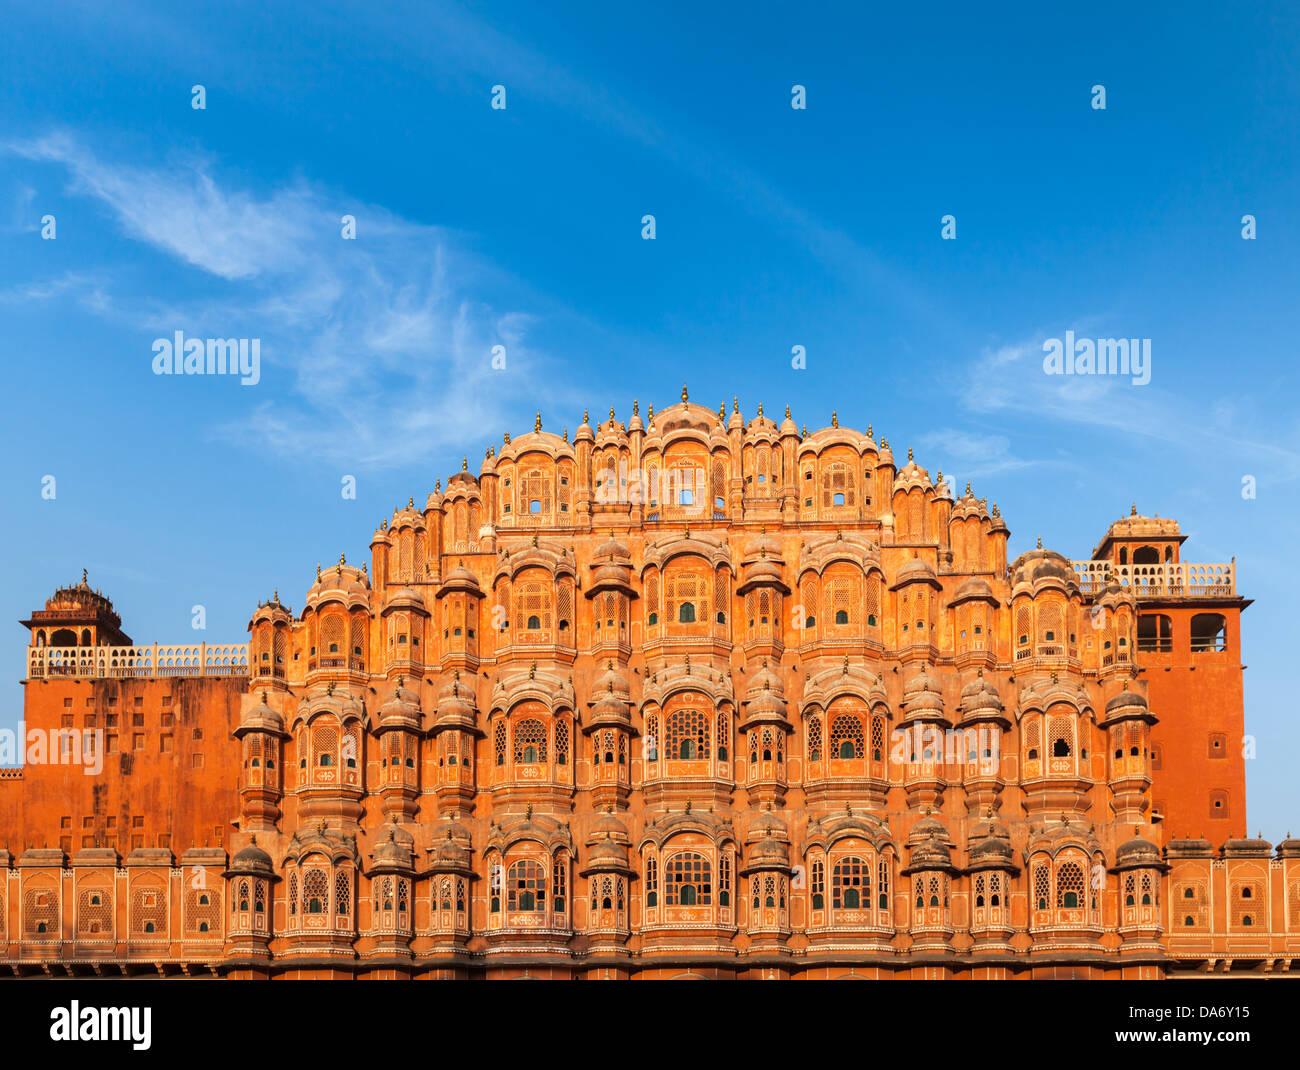 Famosa Rajasthan landmark - Hawa Mahal Palace (Palazzo dei venti), Jaipur, Rajasthan Immagini Stock